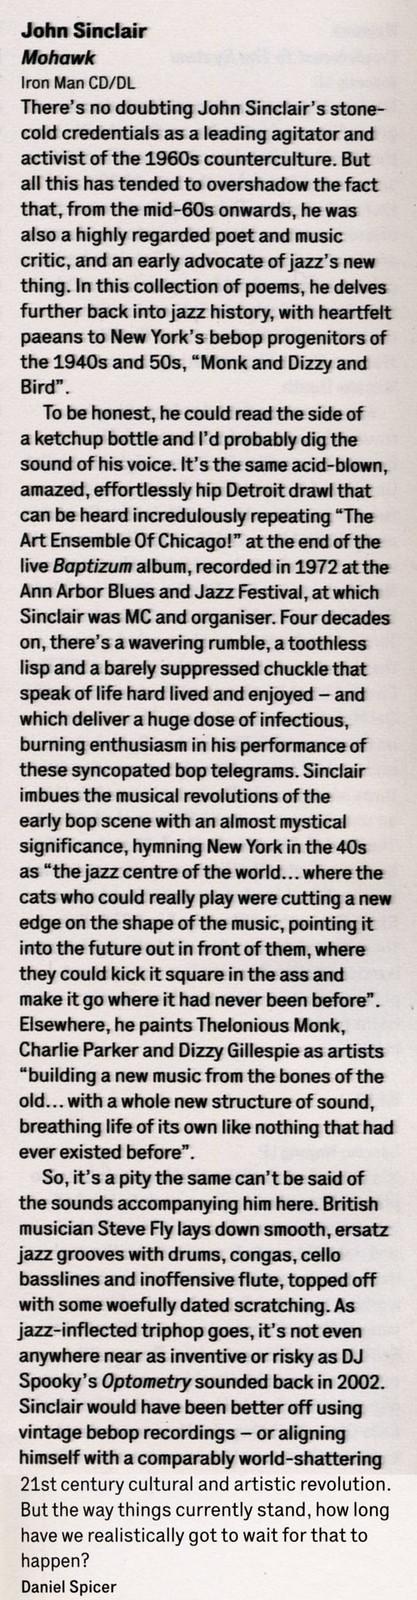 John Sinclair - Mohawk - The Wire - March 2014 album review